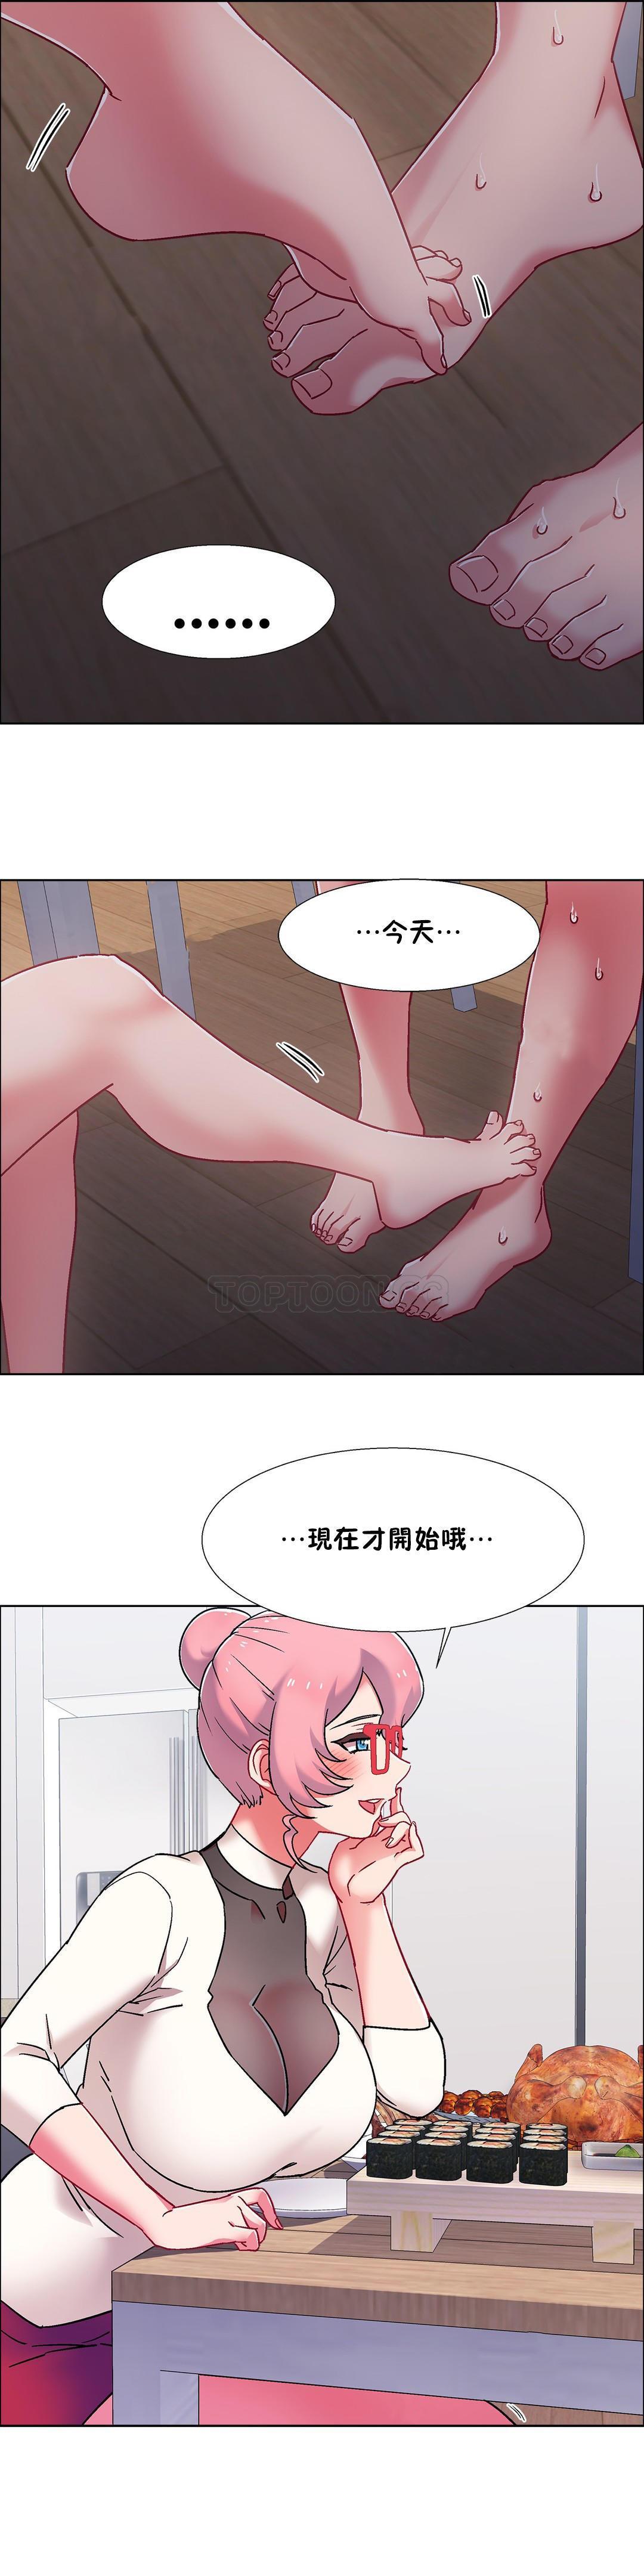 [Studio Wannabe] Rental Girls | 出租女郎 Ch. 33-58 [Chinese]  第二季 完结 528